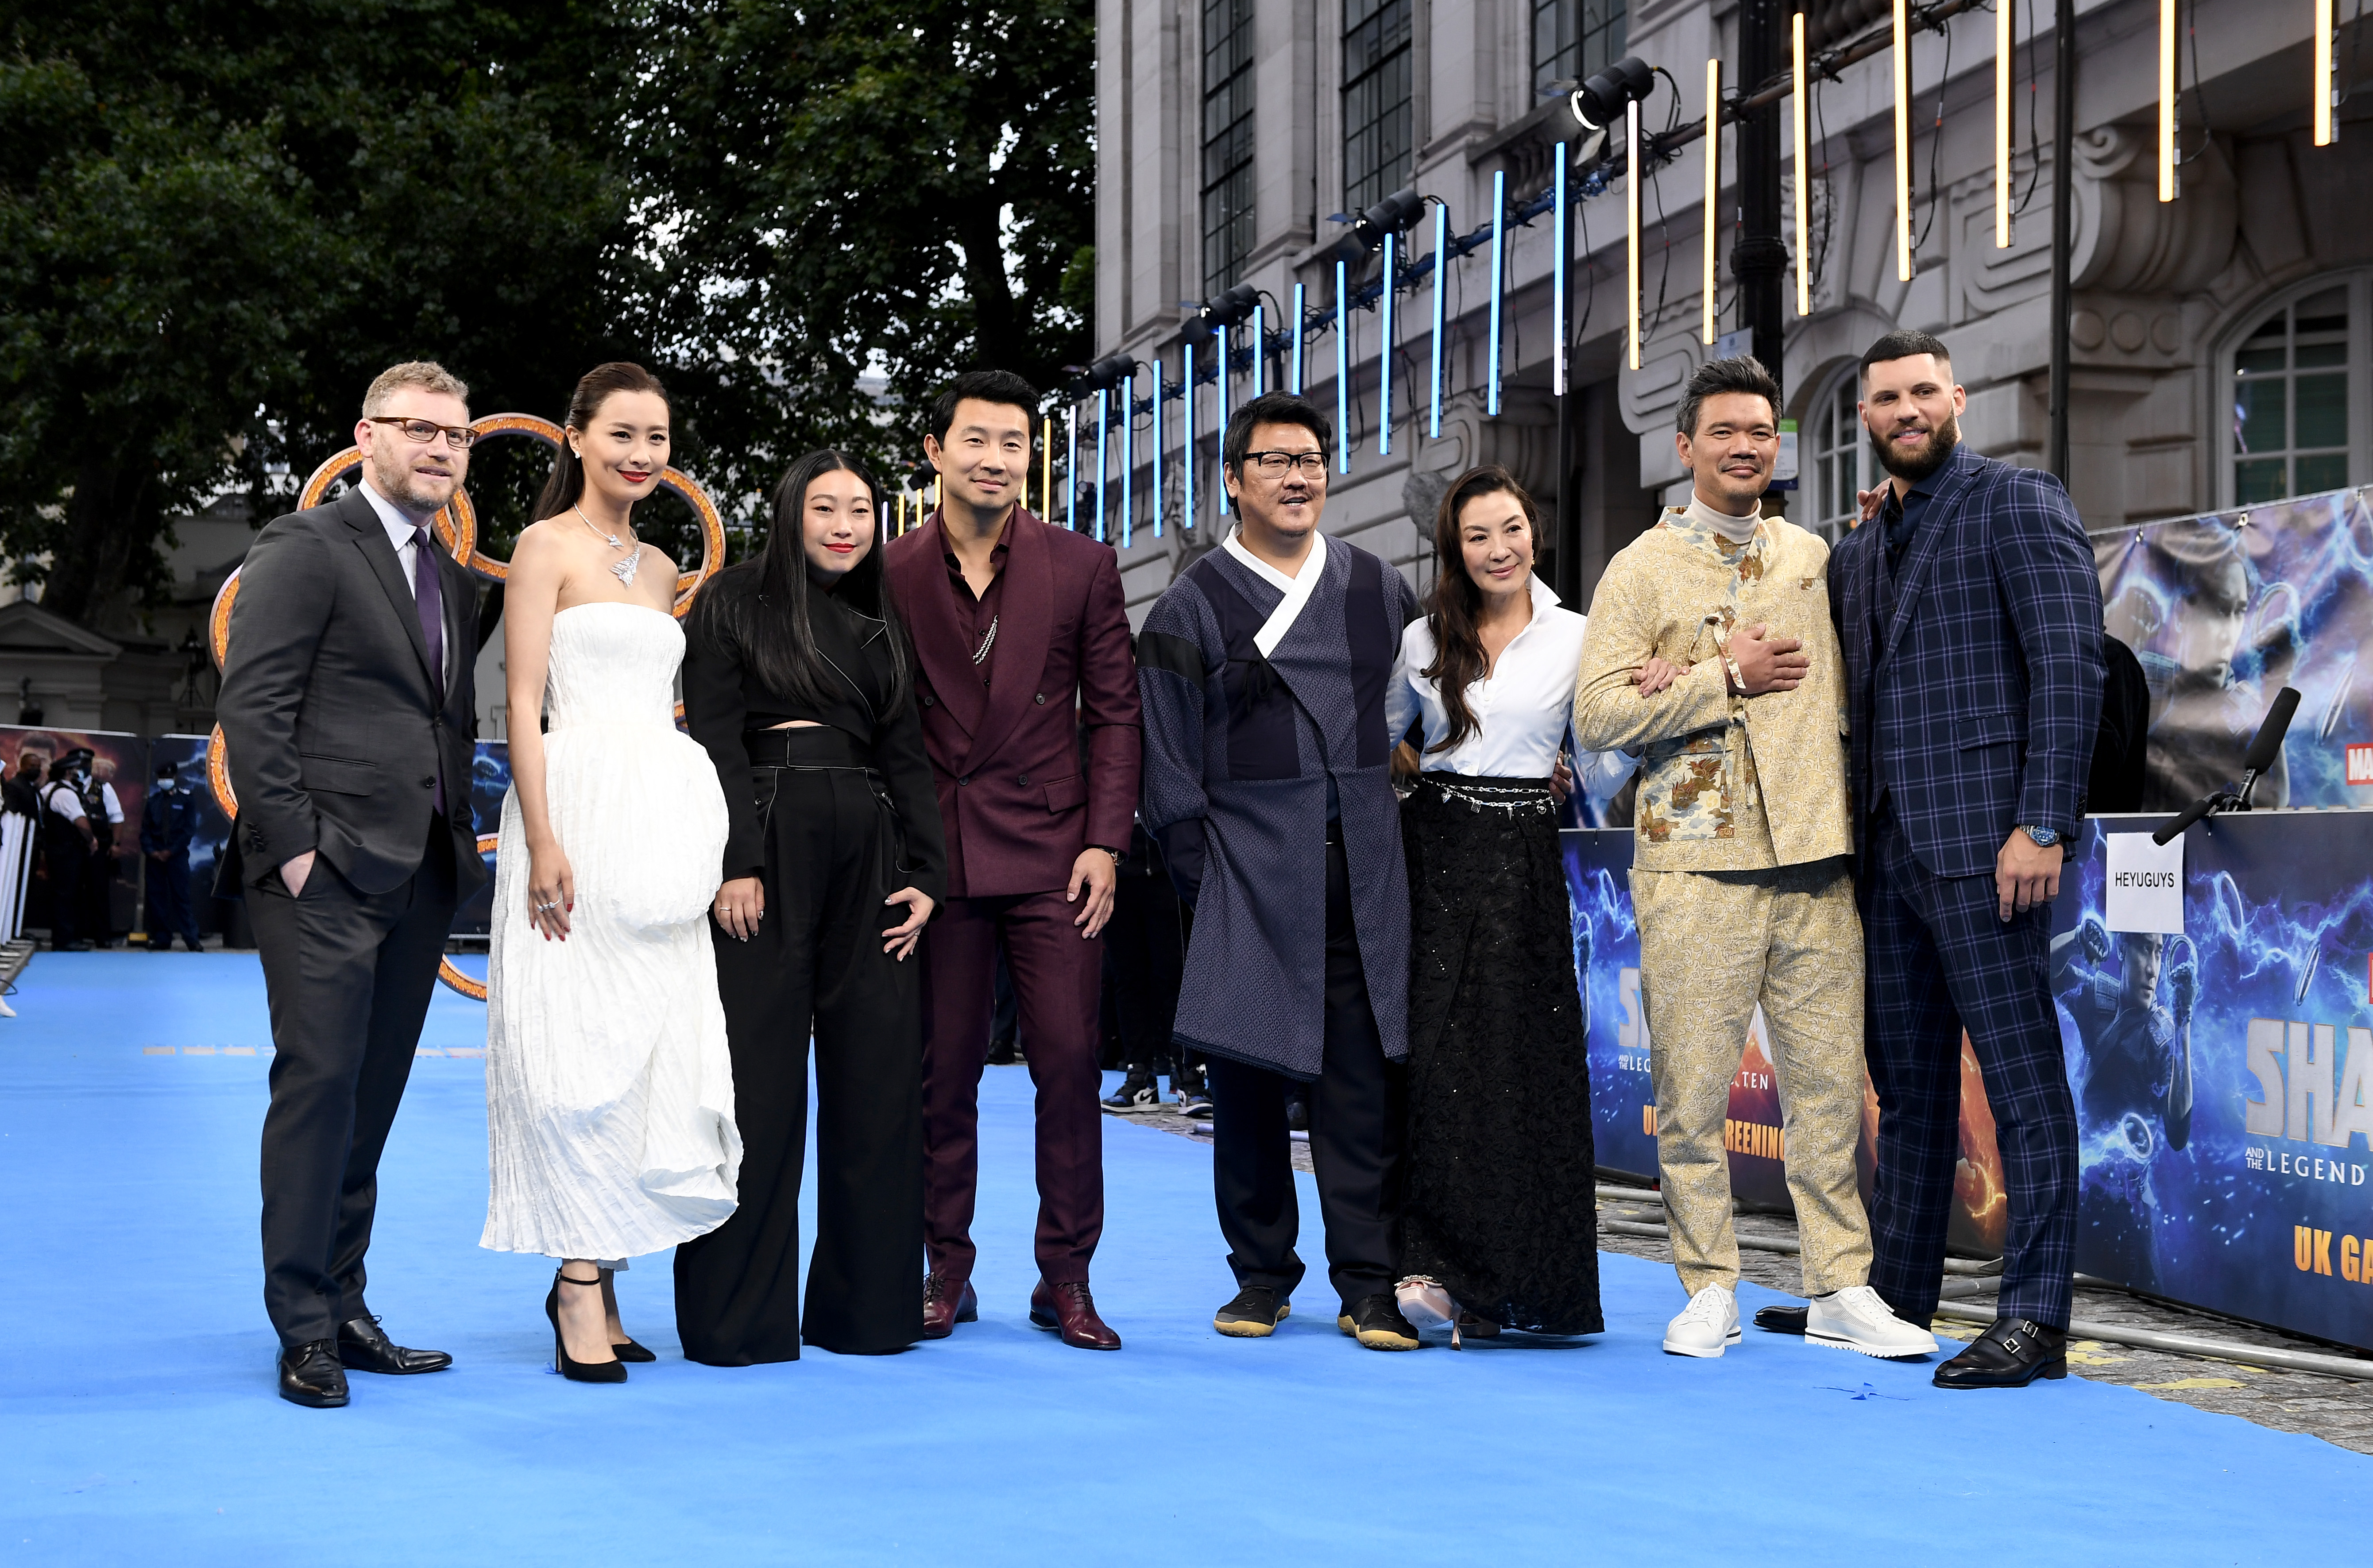 Michelle Yeoh, Benedict Wong, Destin Daniel Cretton, Fala Chen, Jonathan Schwartz, Simu Liu, Awkwafina, and Florian Munteanu at an event for Shang-Chi and the Legend of the Ten Rings (2021)